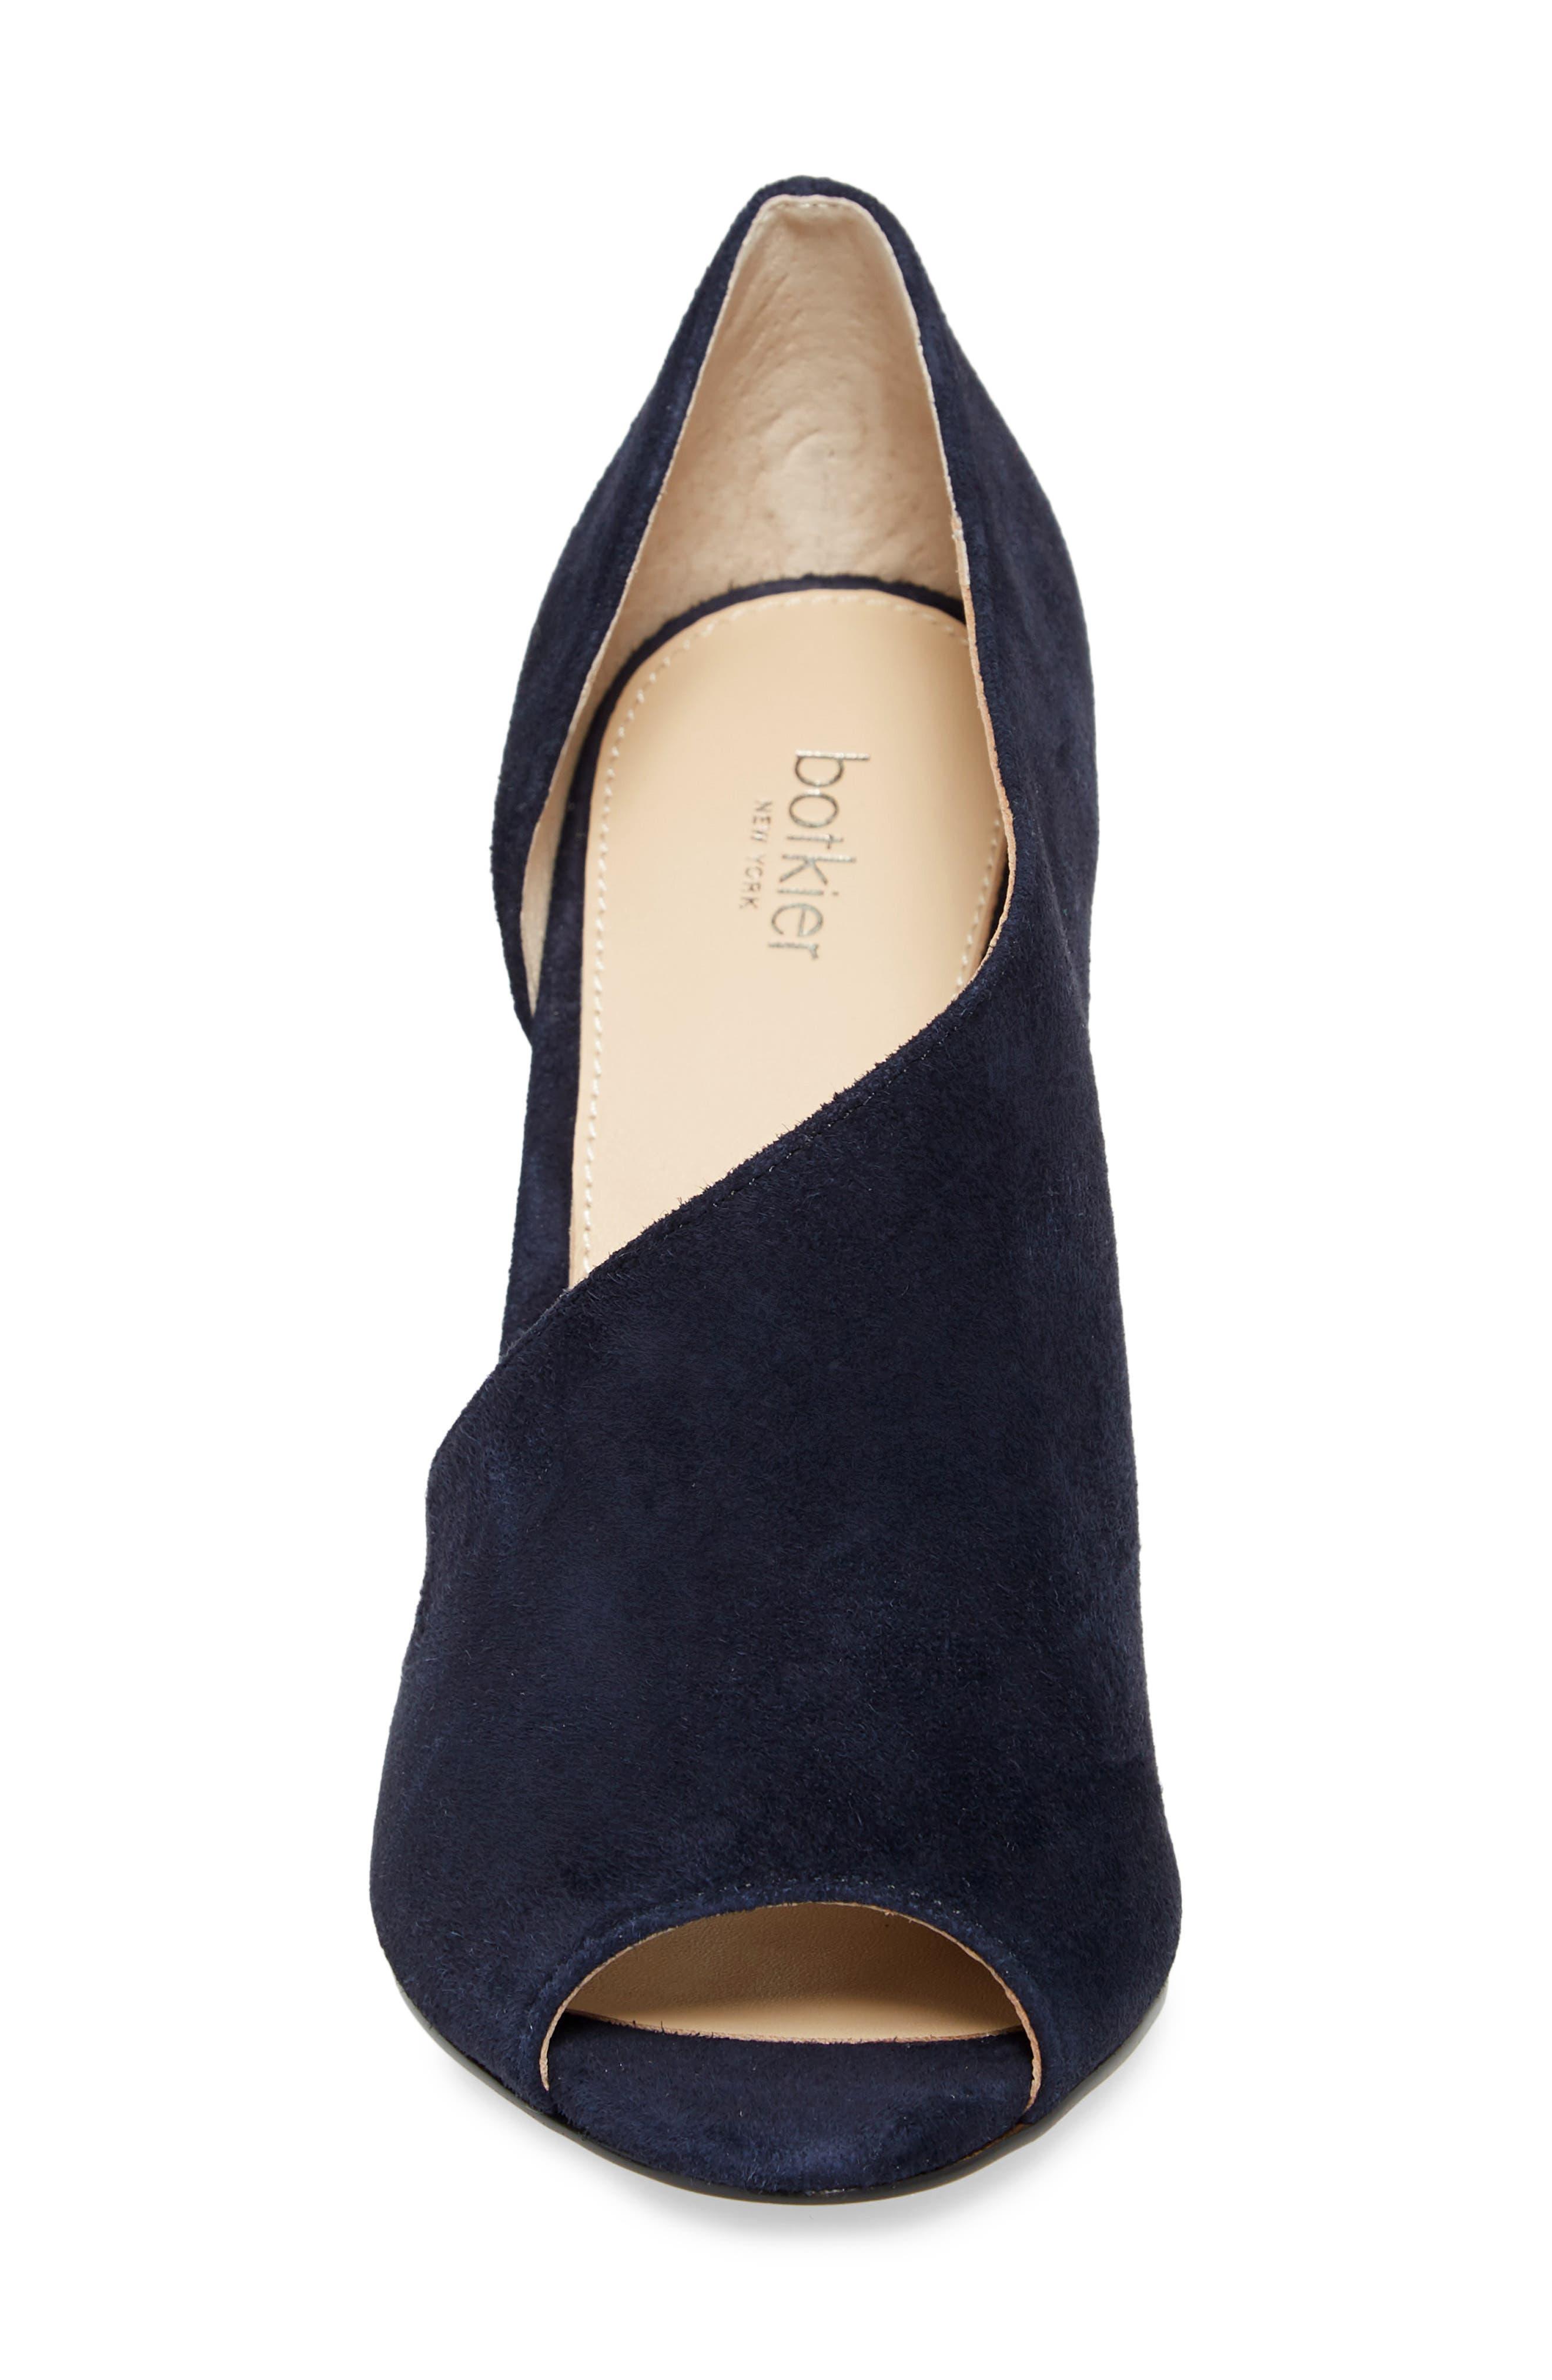 Adelia Asymmetrical Sandal,                             Alternate thumbnail 4, color,                             Navy Suede